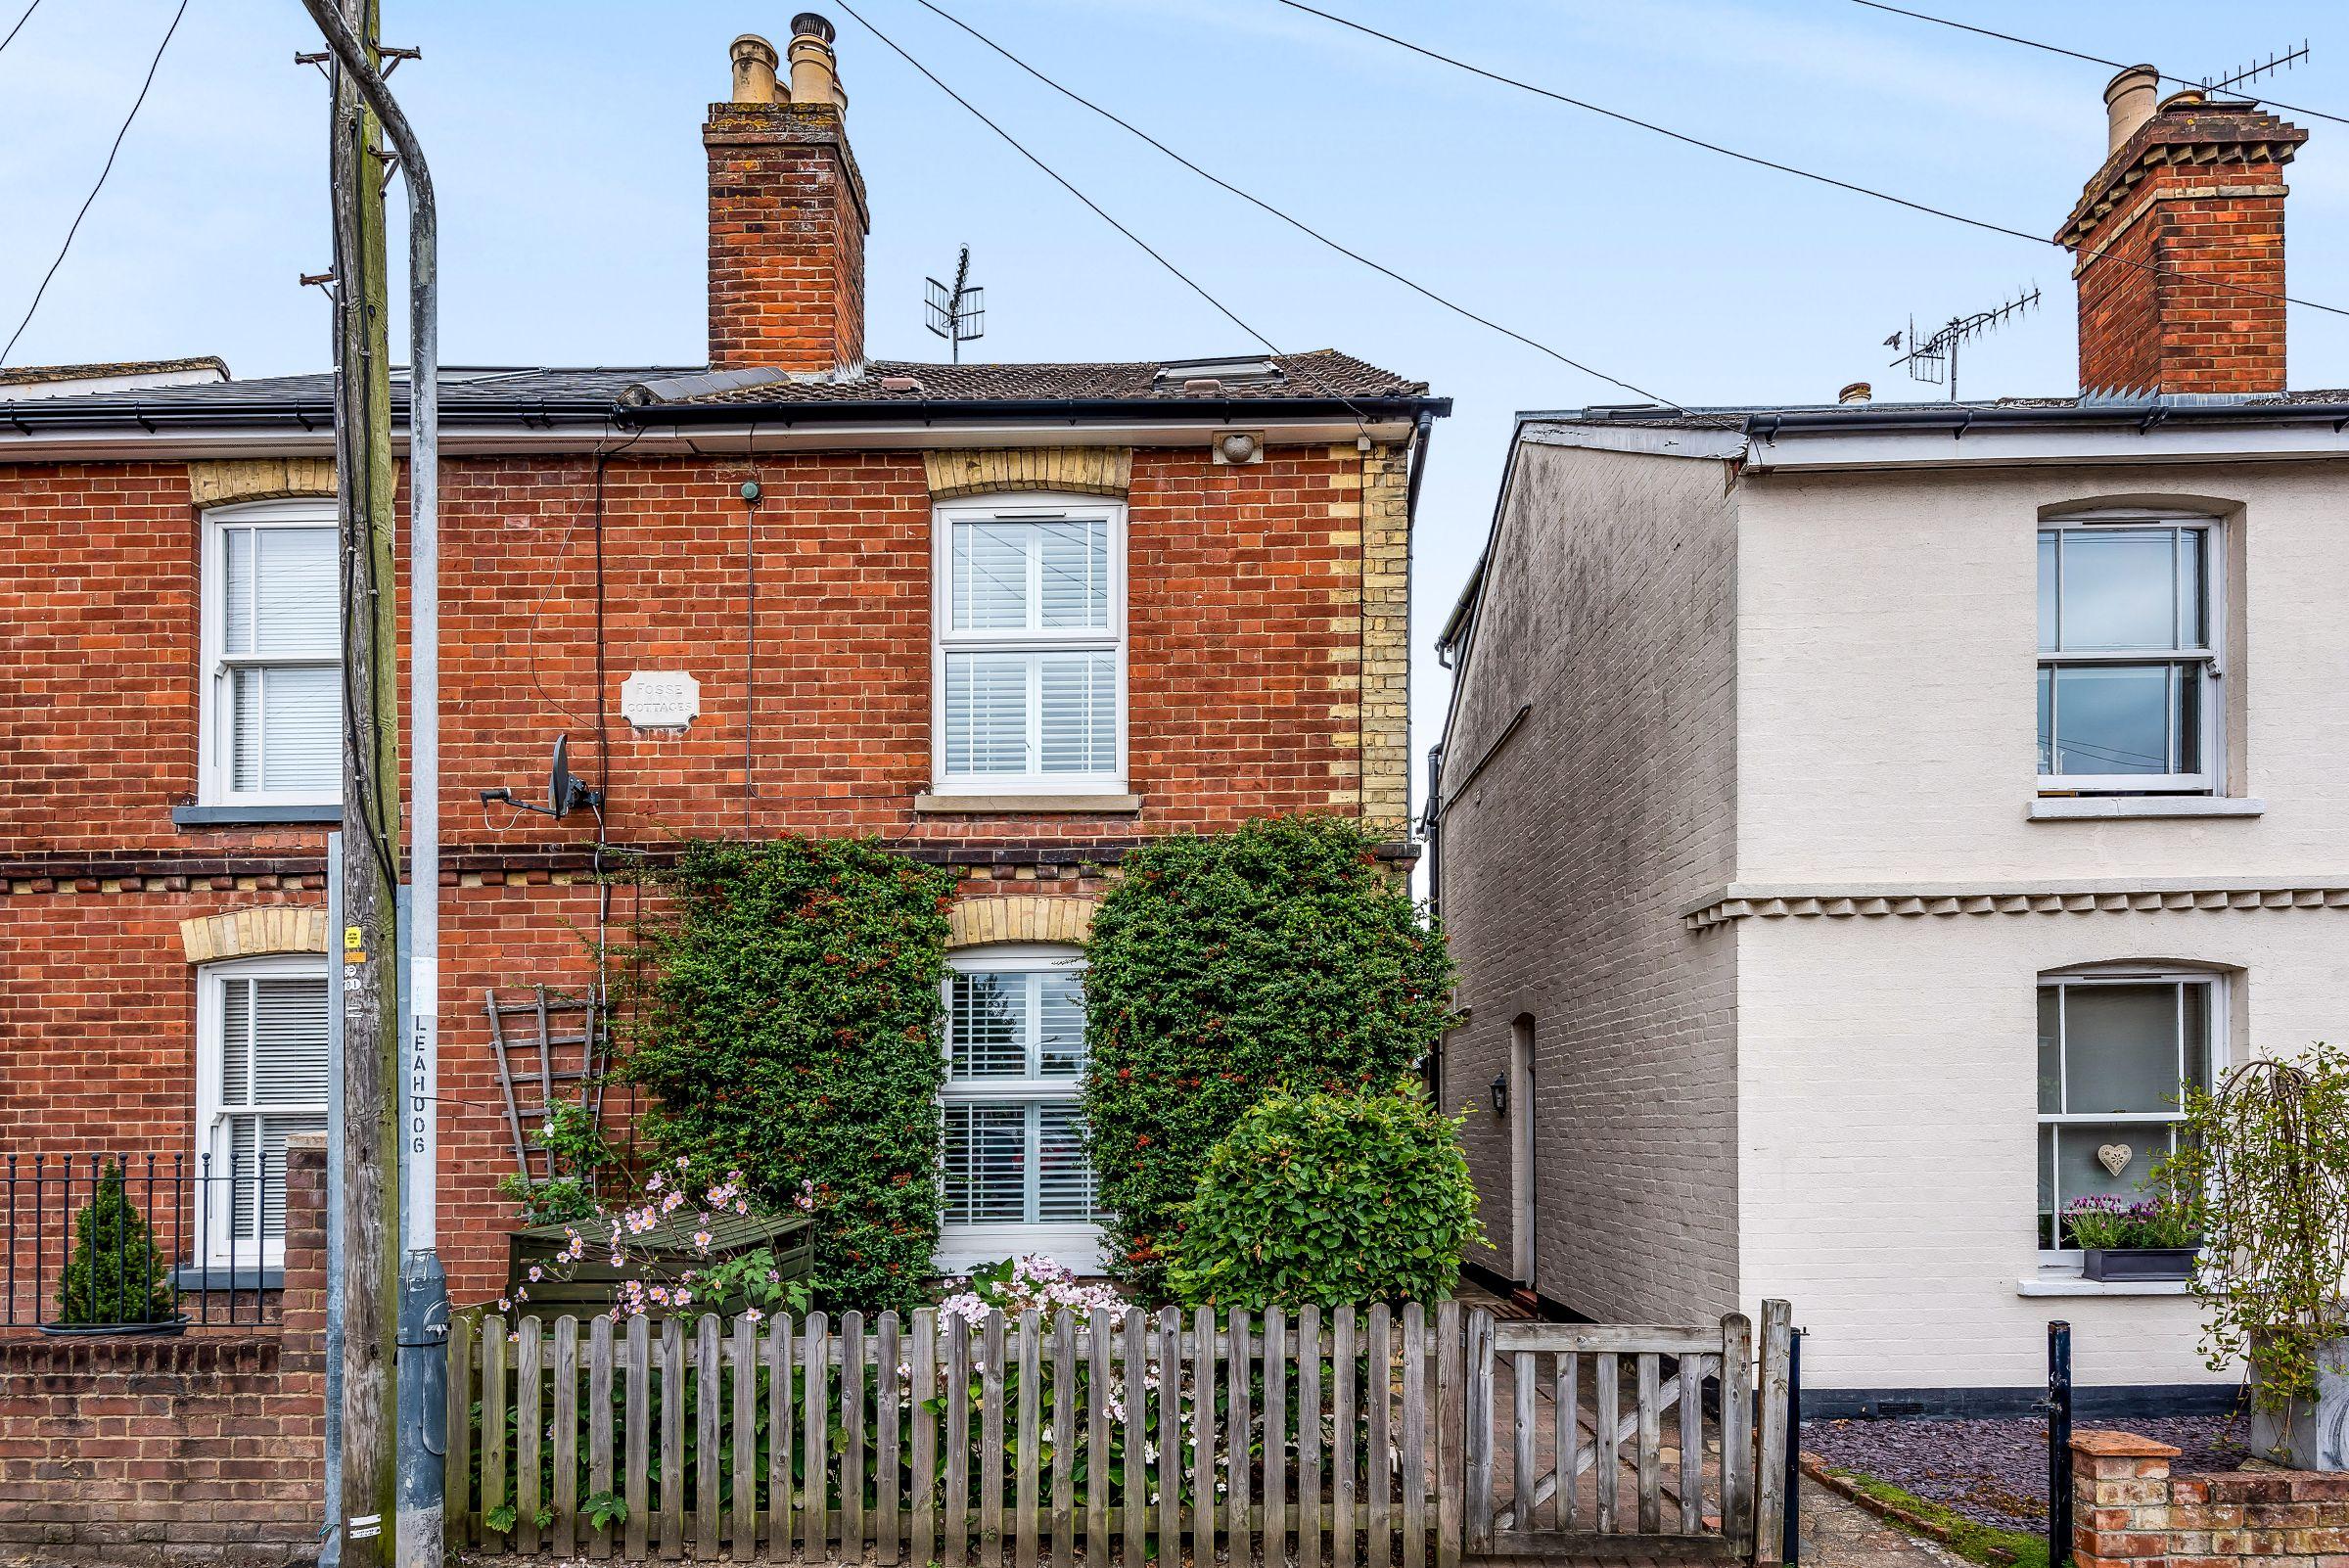 Edward Street, Southborough, Tunbridge Wells